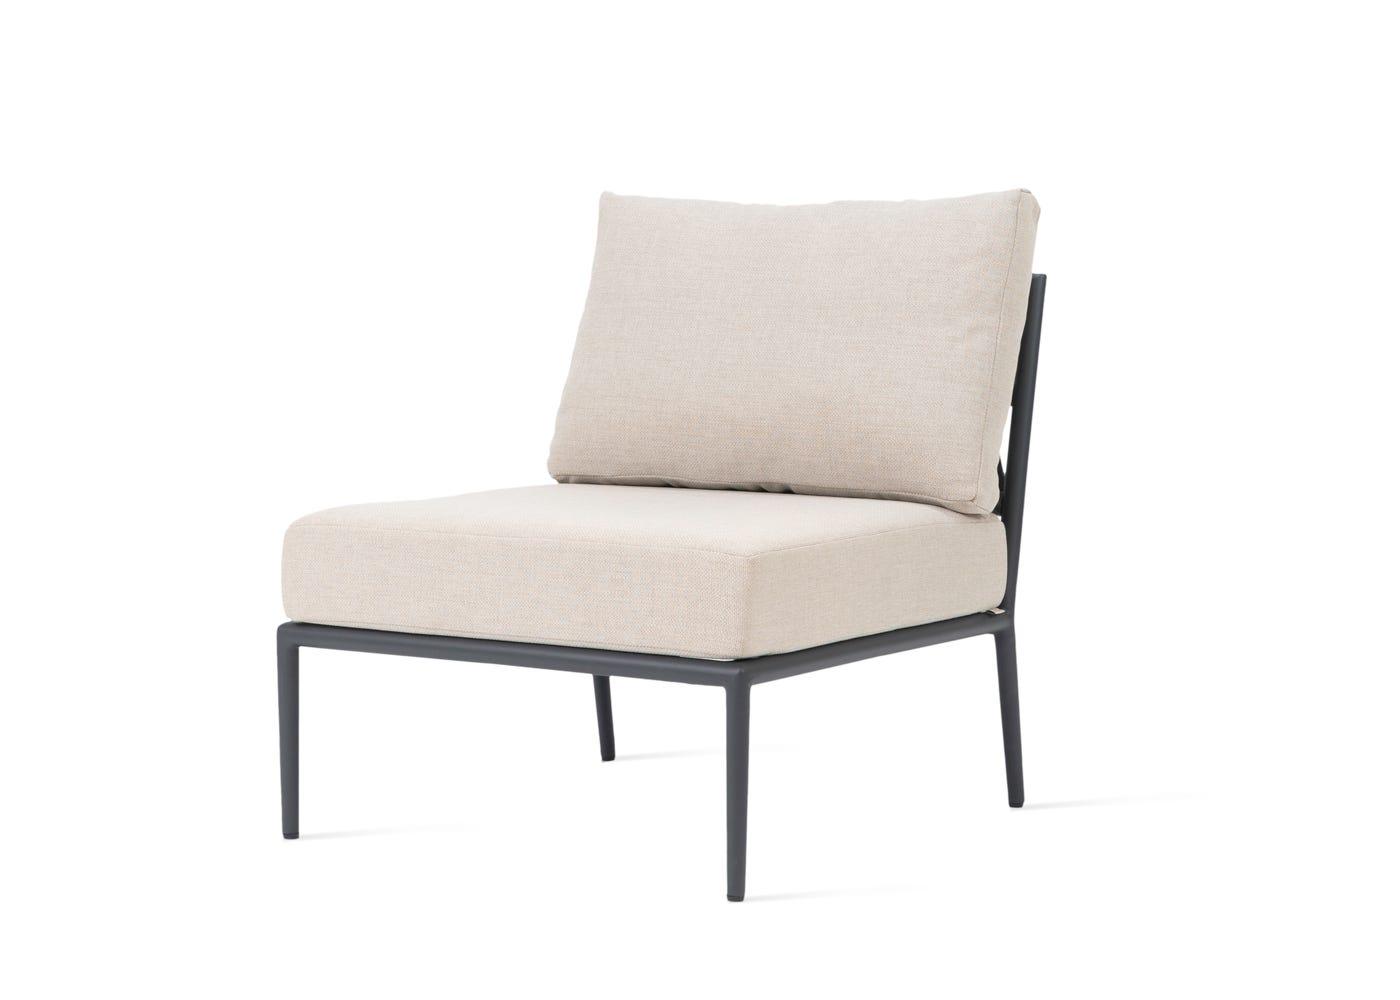 Single sofa section